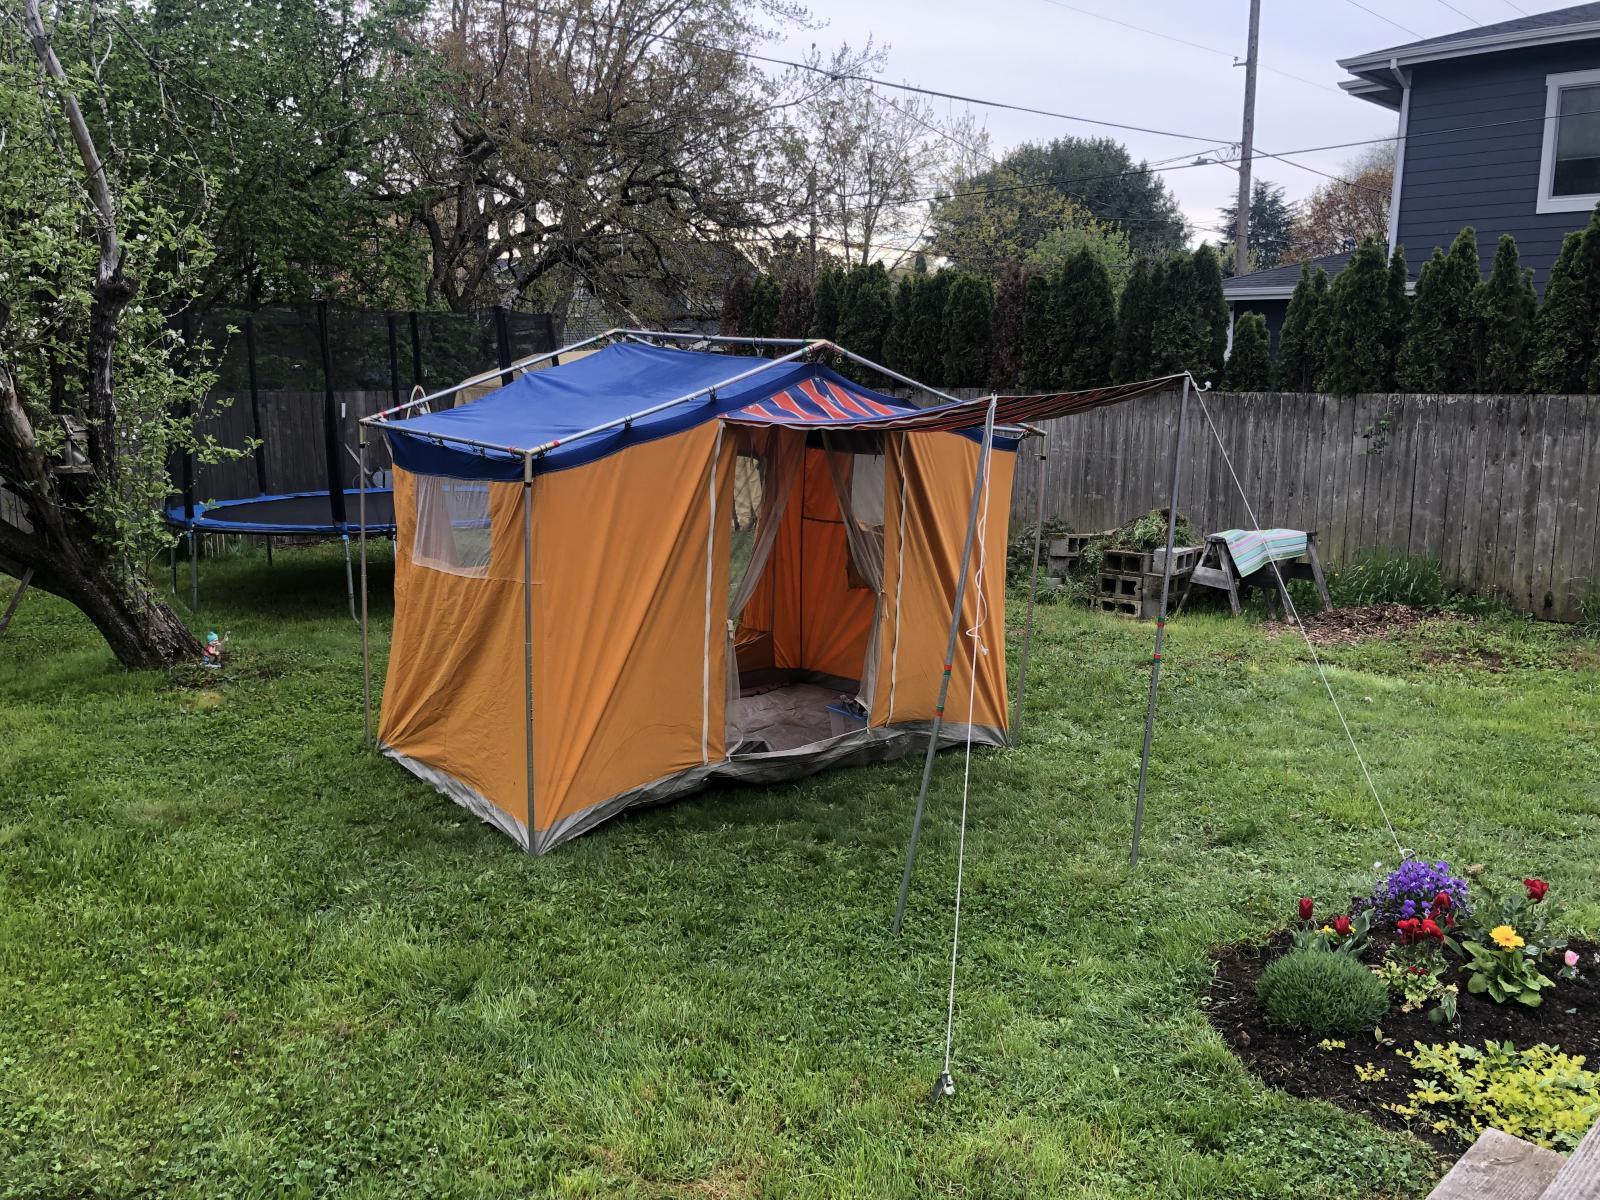 Bay window tent